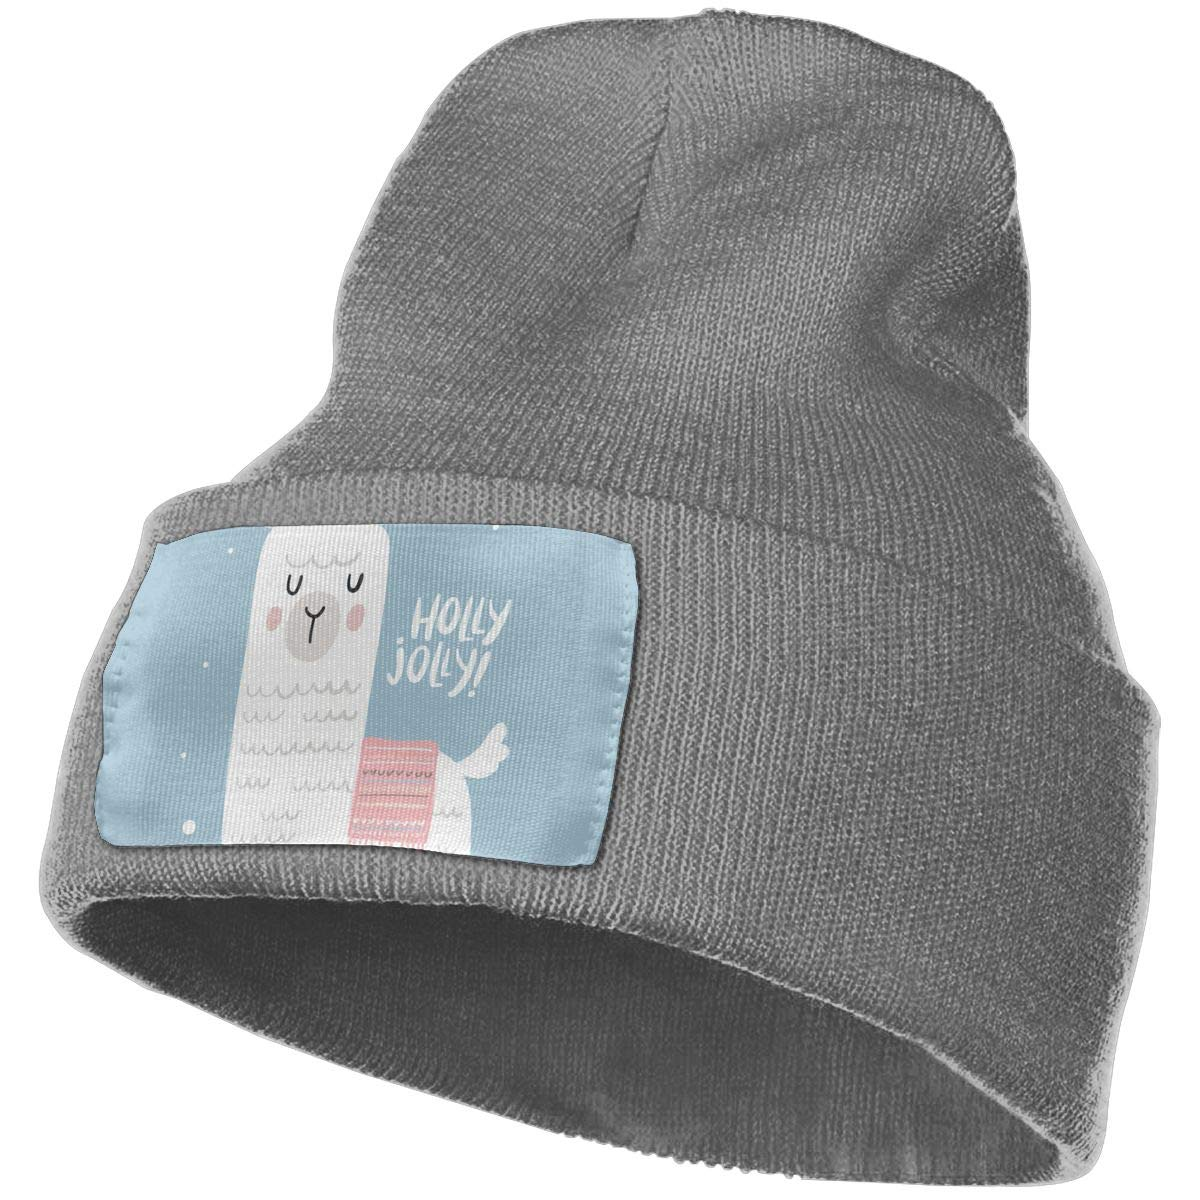 JimHappy Hello Jolly Winter Warm Hats,Knit Slouchy Thick Skull Cap Black